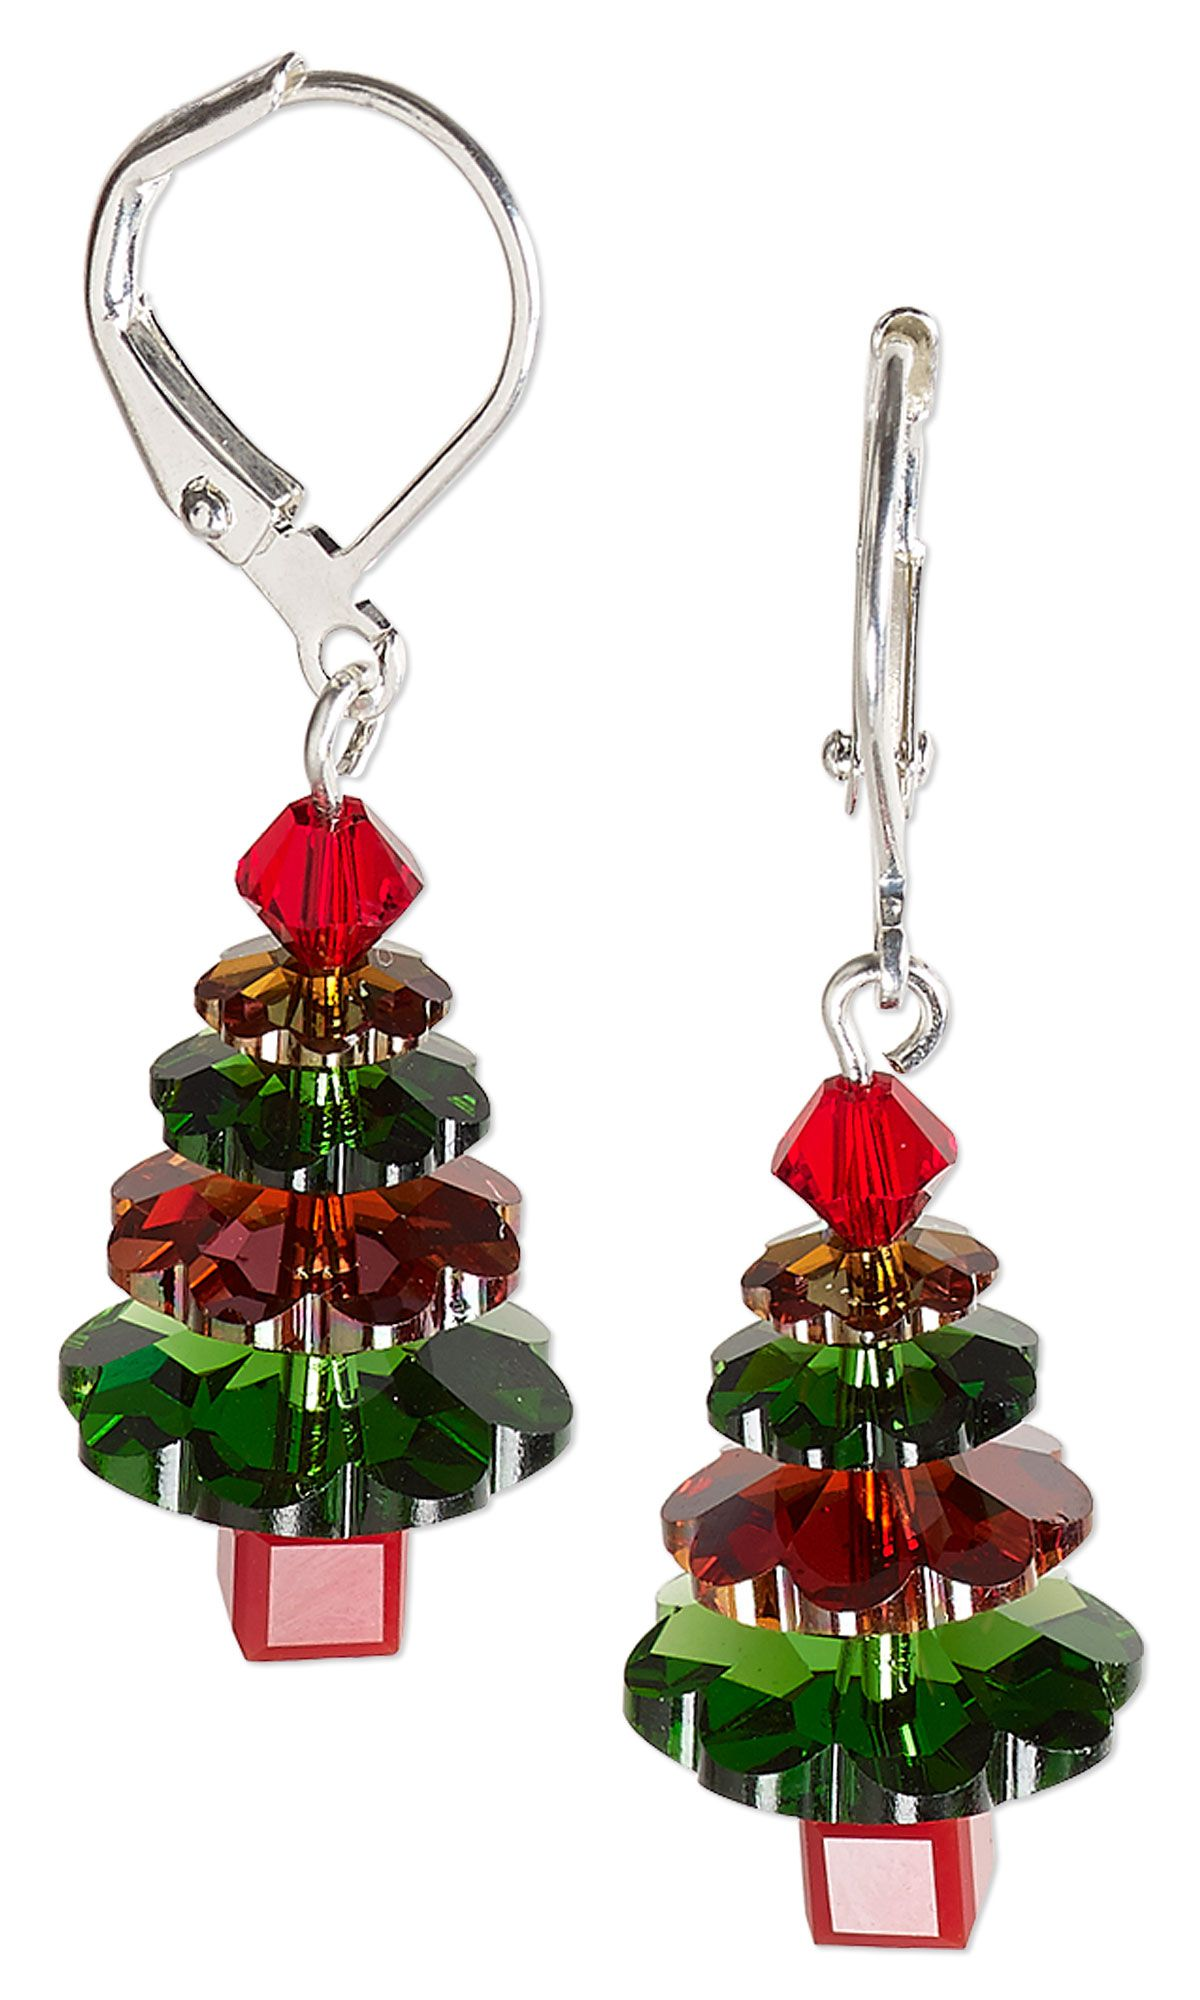 65676f1752b3d Jewelry Design - Christmas Tree Earrings with Swarovski Crystal ...